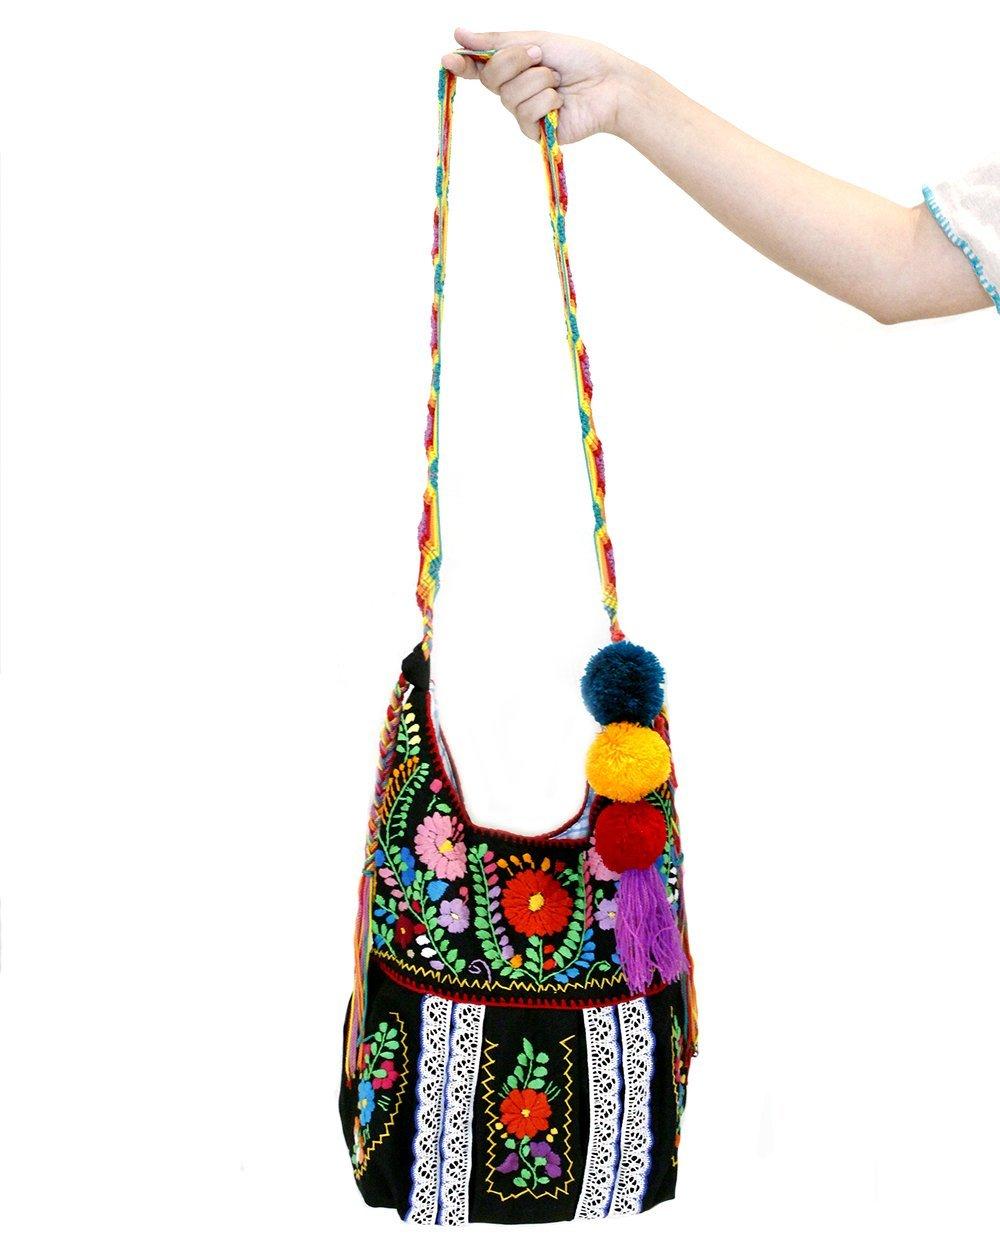 Jody Crossbody Handbag Purse Mexican Embroidery